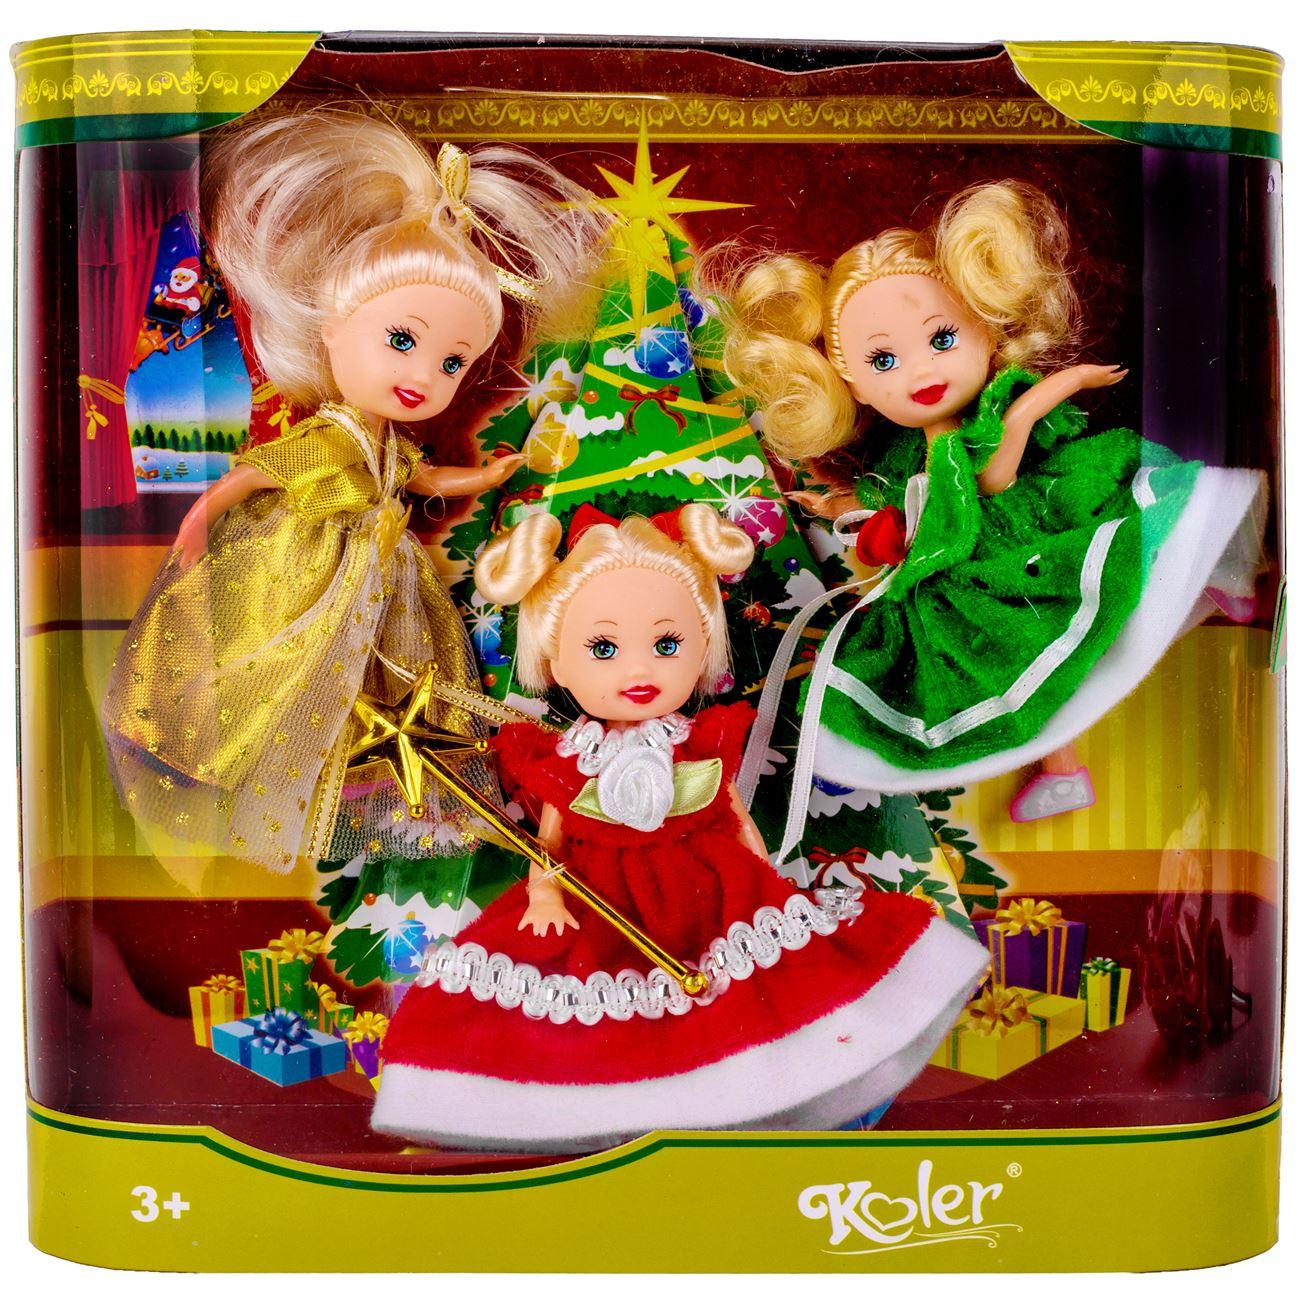 c15f137c40ae Χριστουγεννιάτικες Κούκλες - 3 τμχ.   Κούκλες Μανεκέν Χριστουγεννιάτικες